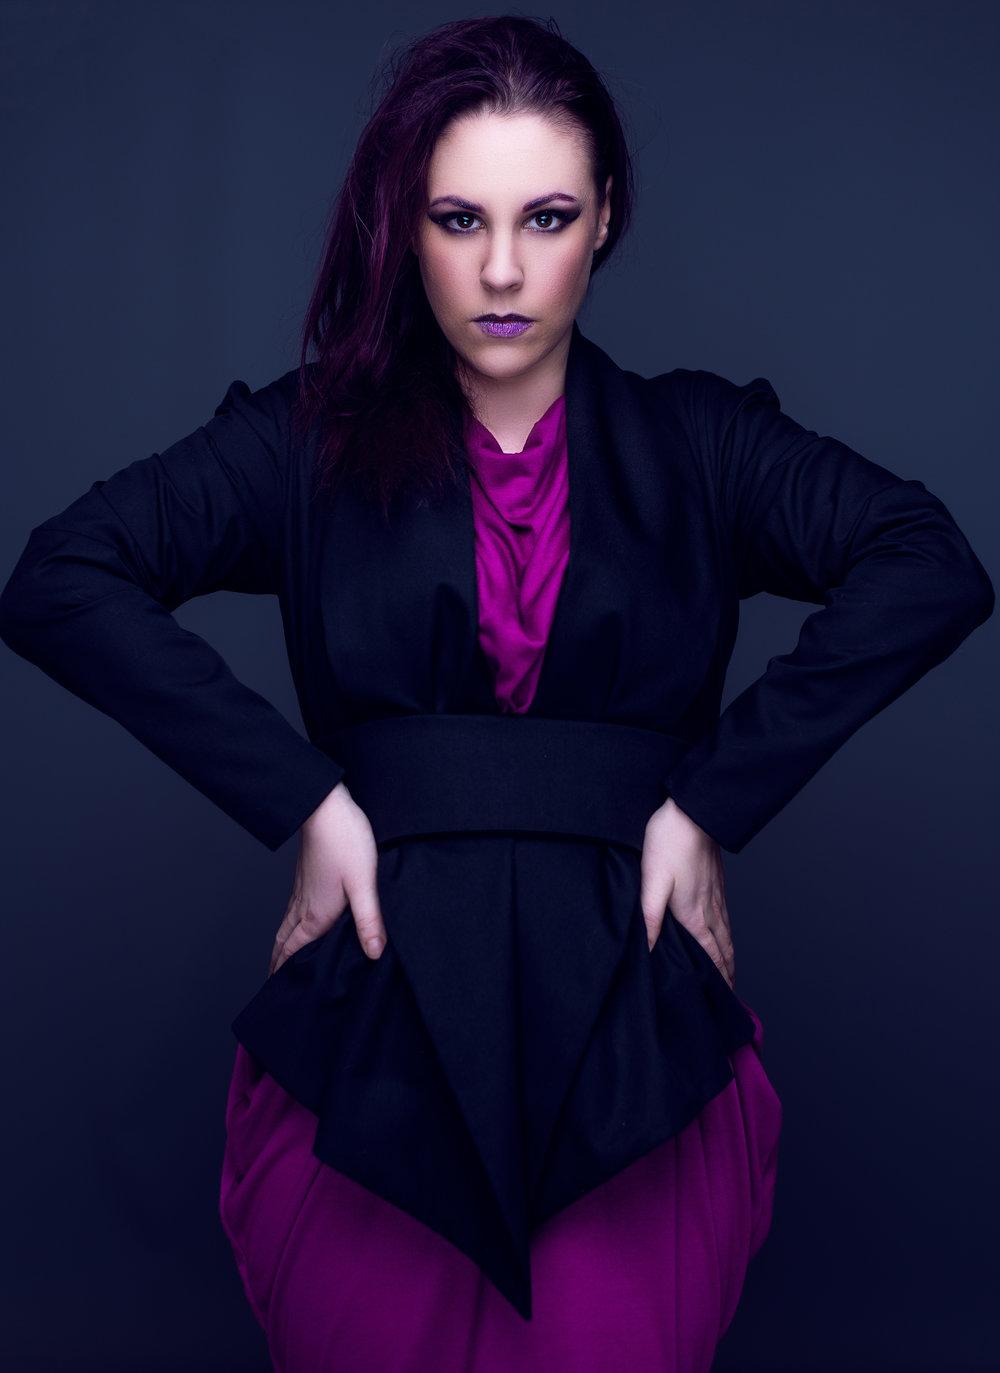 zaramia-ava-zaramiaava-leeds-fashion-designer-ethical-sustainable-mio-tailored-minimalist-jacket-black-ayaka-magenta-dress-versatile-drape-cowl-styling-studio-womenswear-models-photoshoot-vibrant